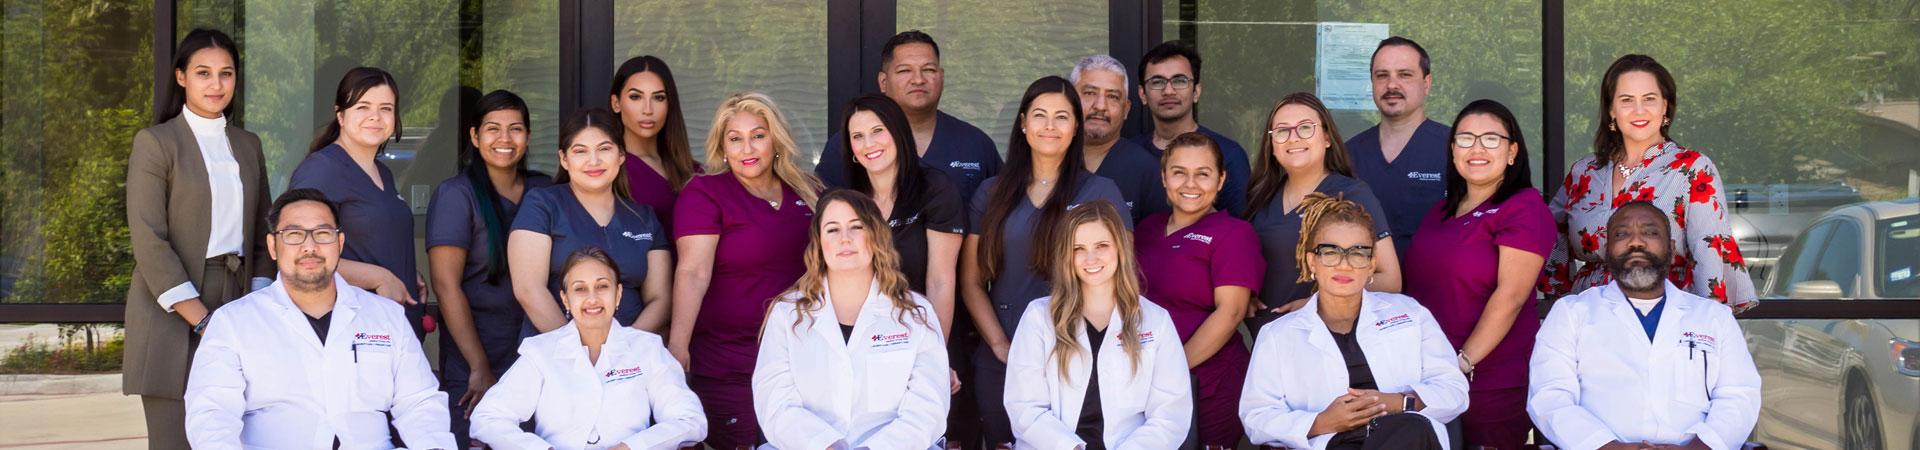 Everest Medical Team